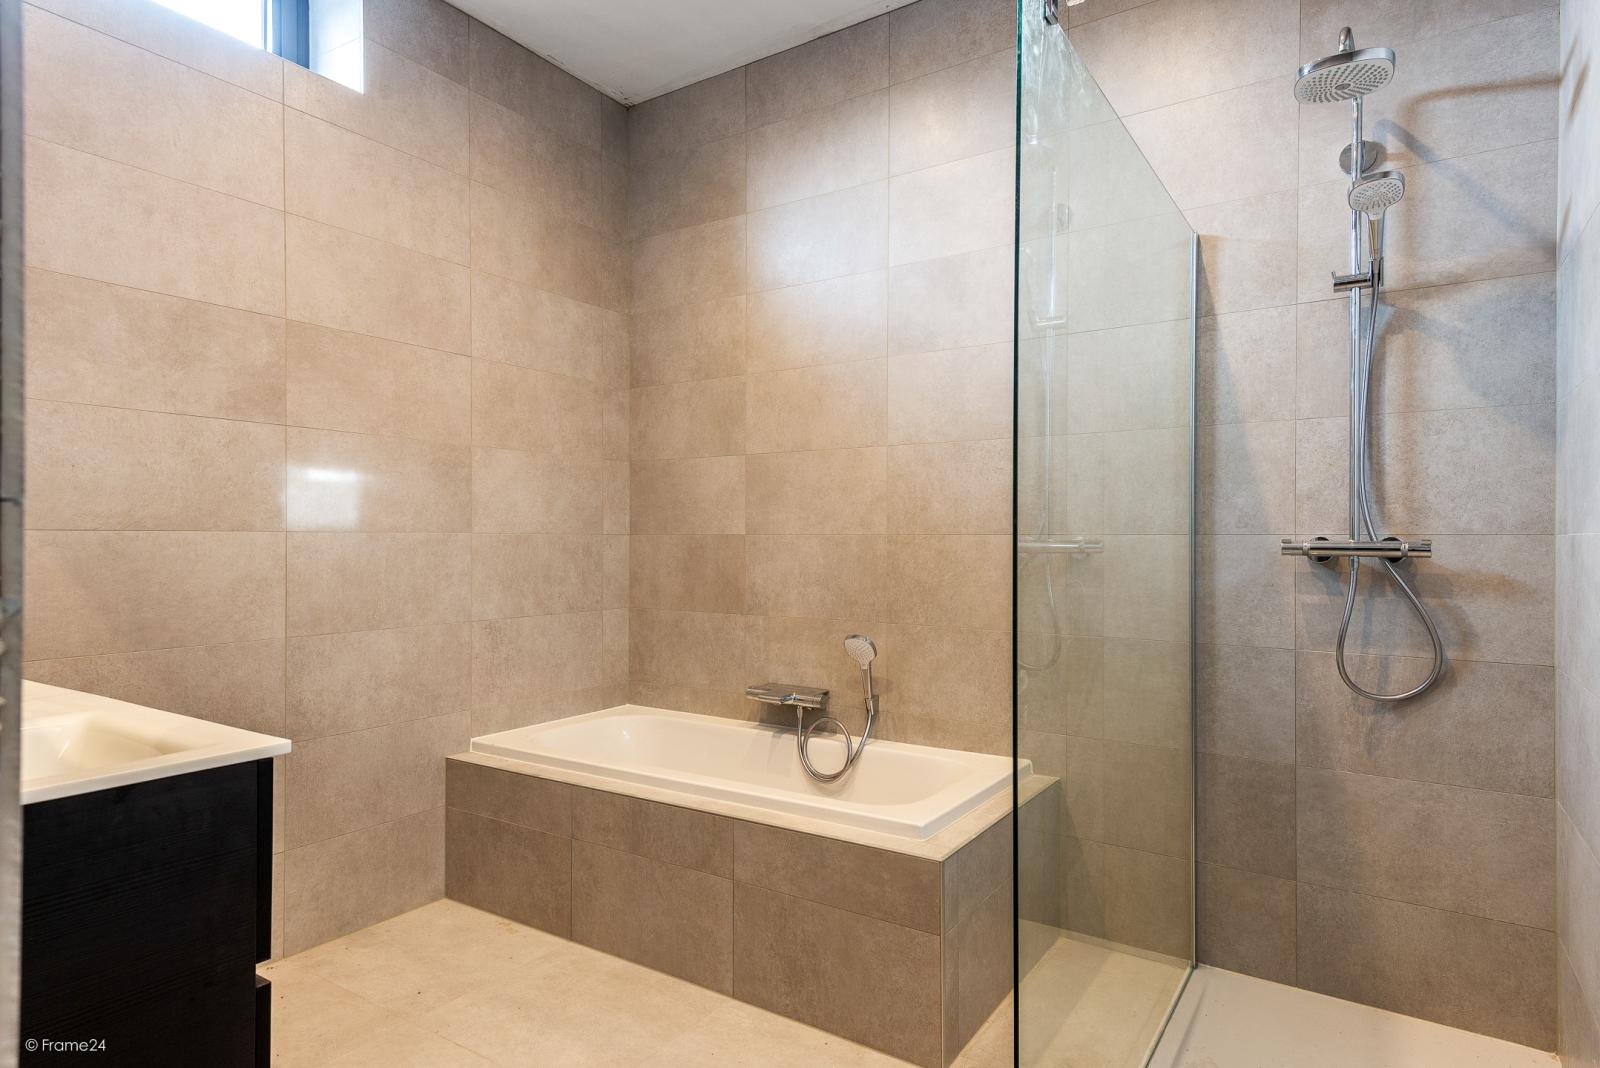 Riant vernieuwd appartement (147 m²) op centrale ligging te Walem! afbeelding 6